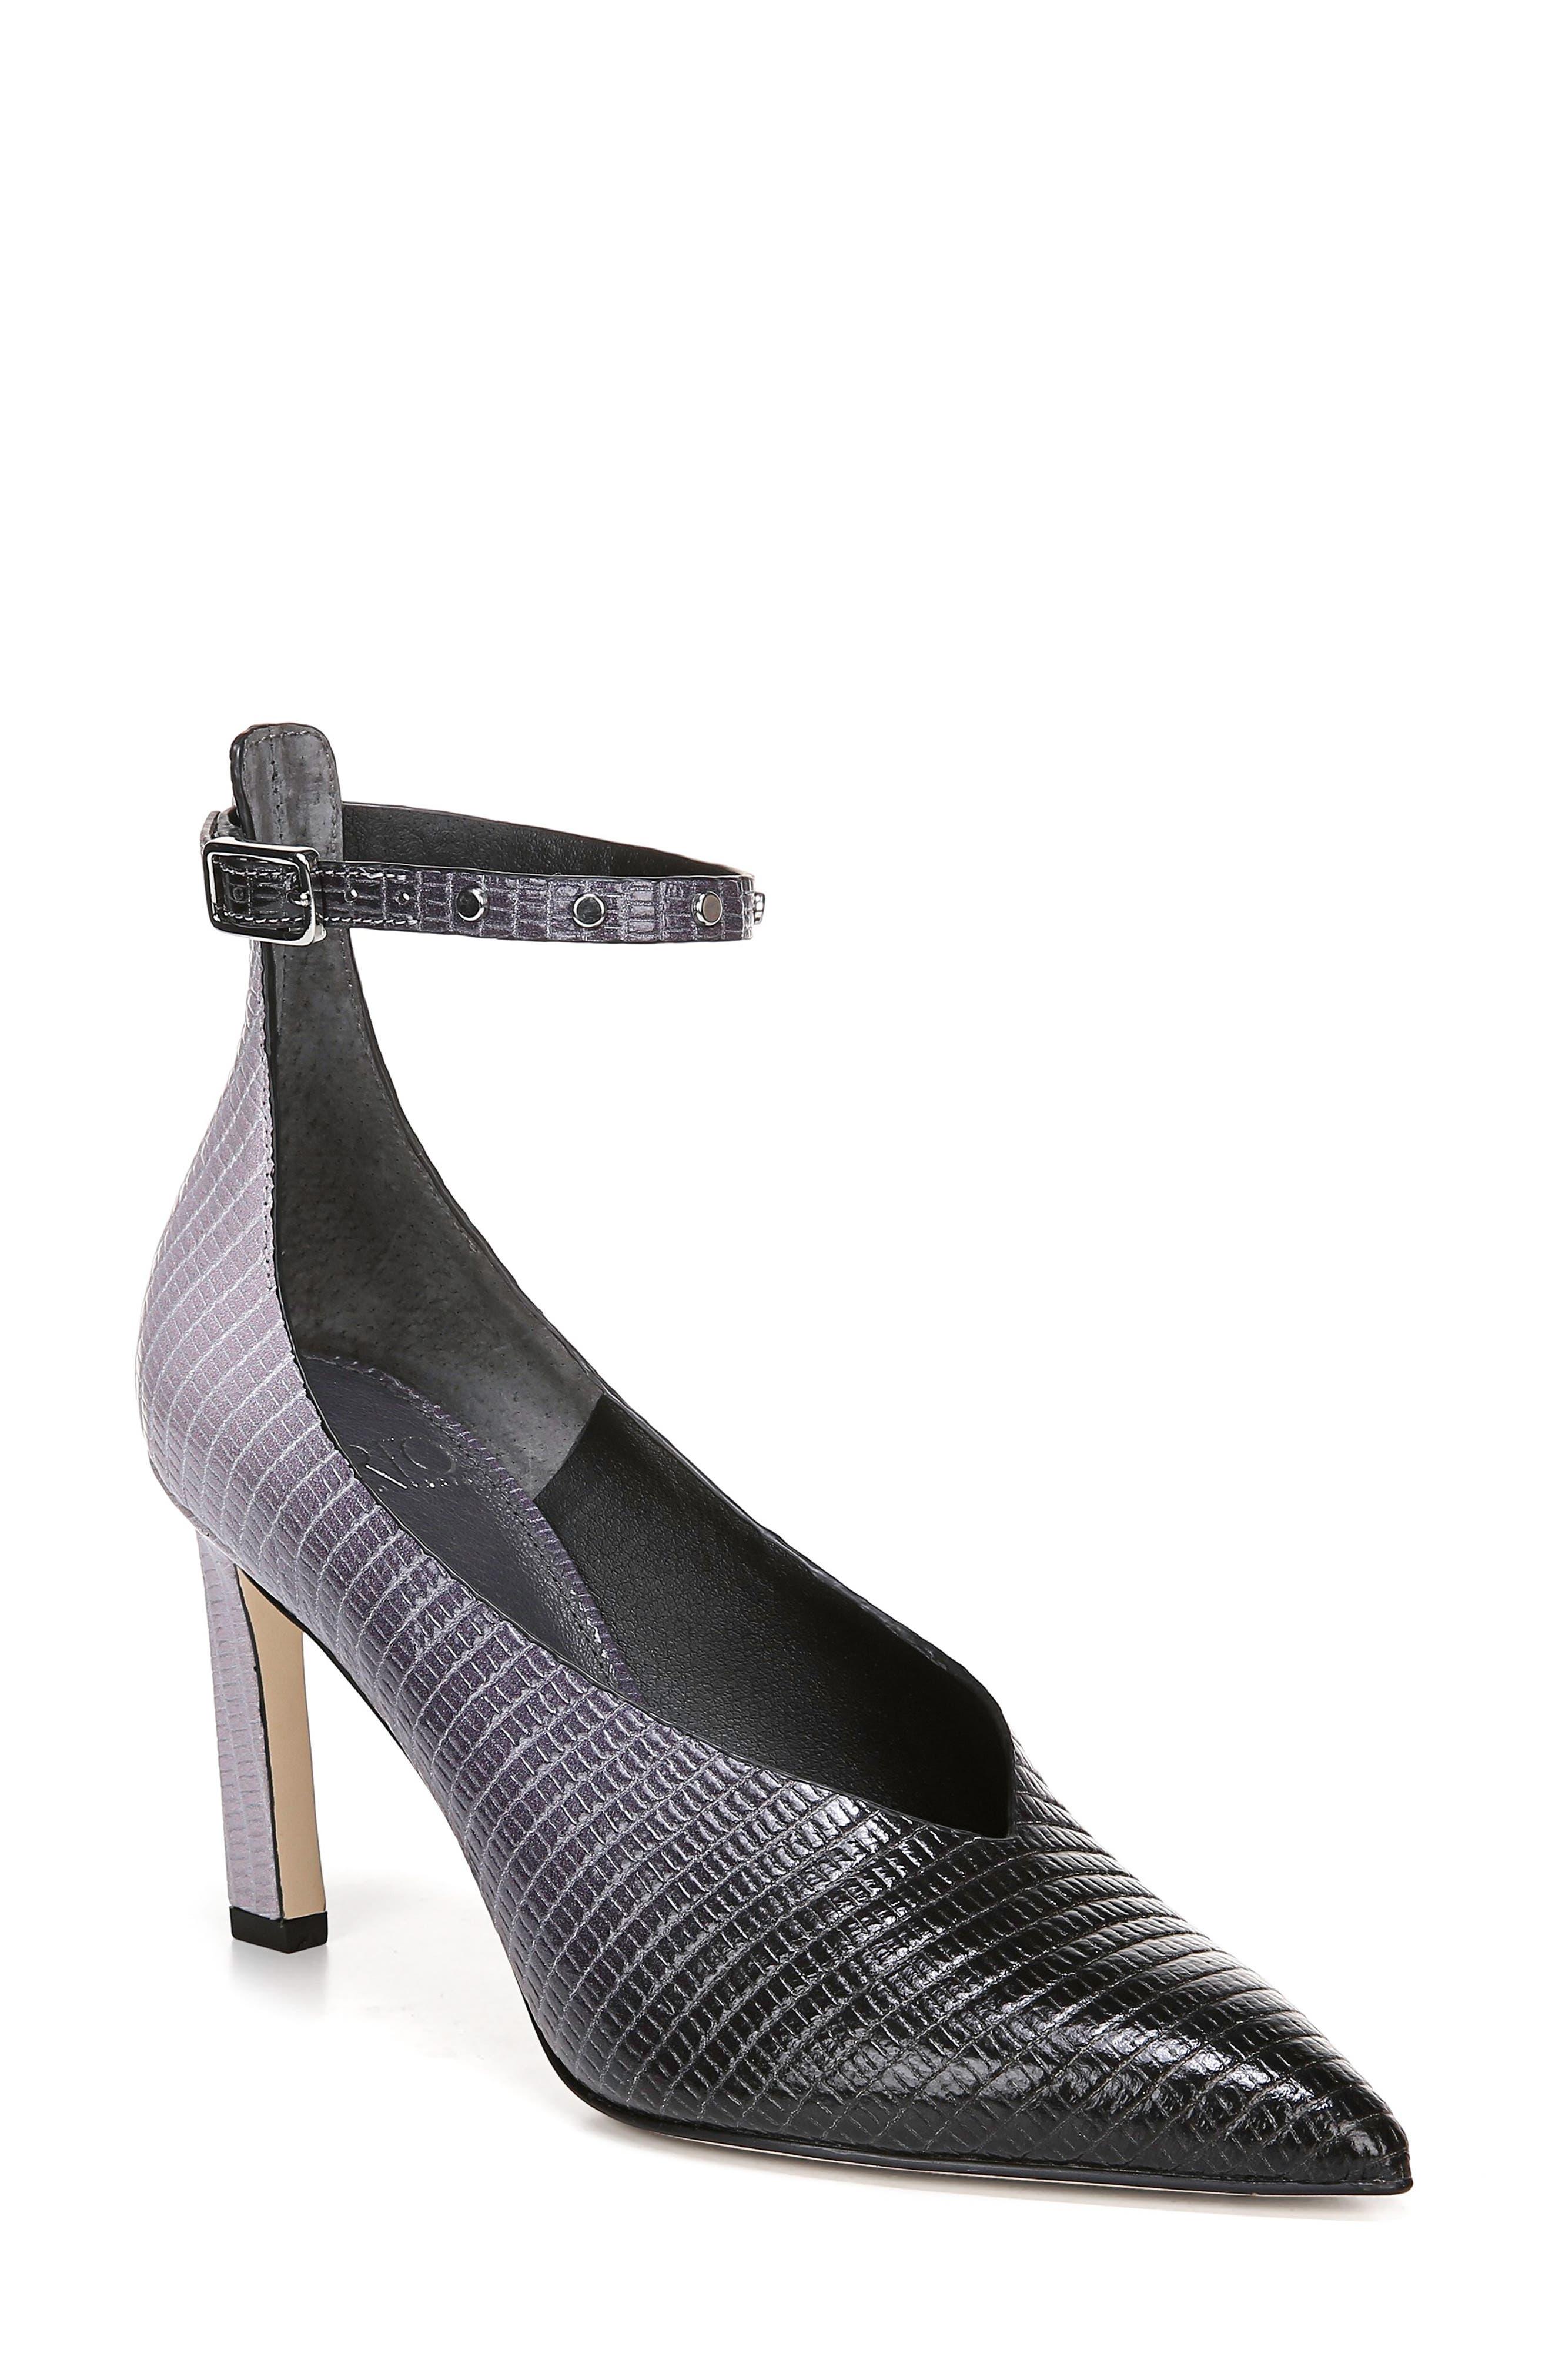 Sarto By Franco Sarto Sarah Ankle Strap Pump, Grey